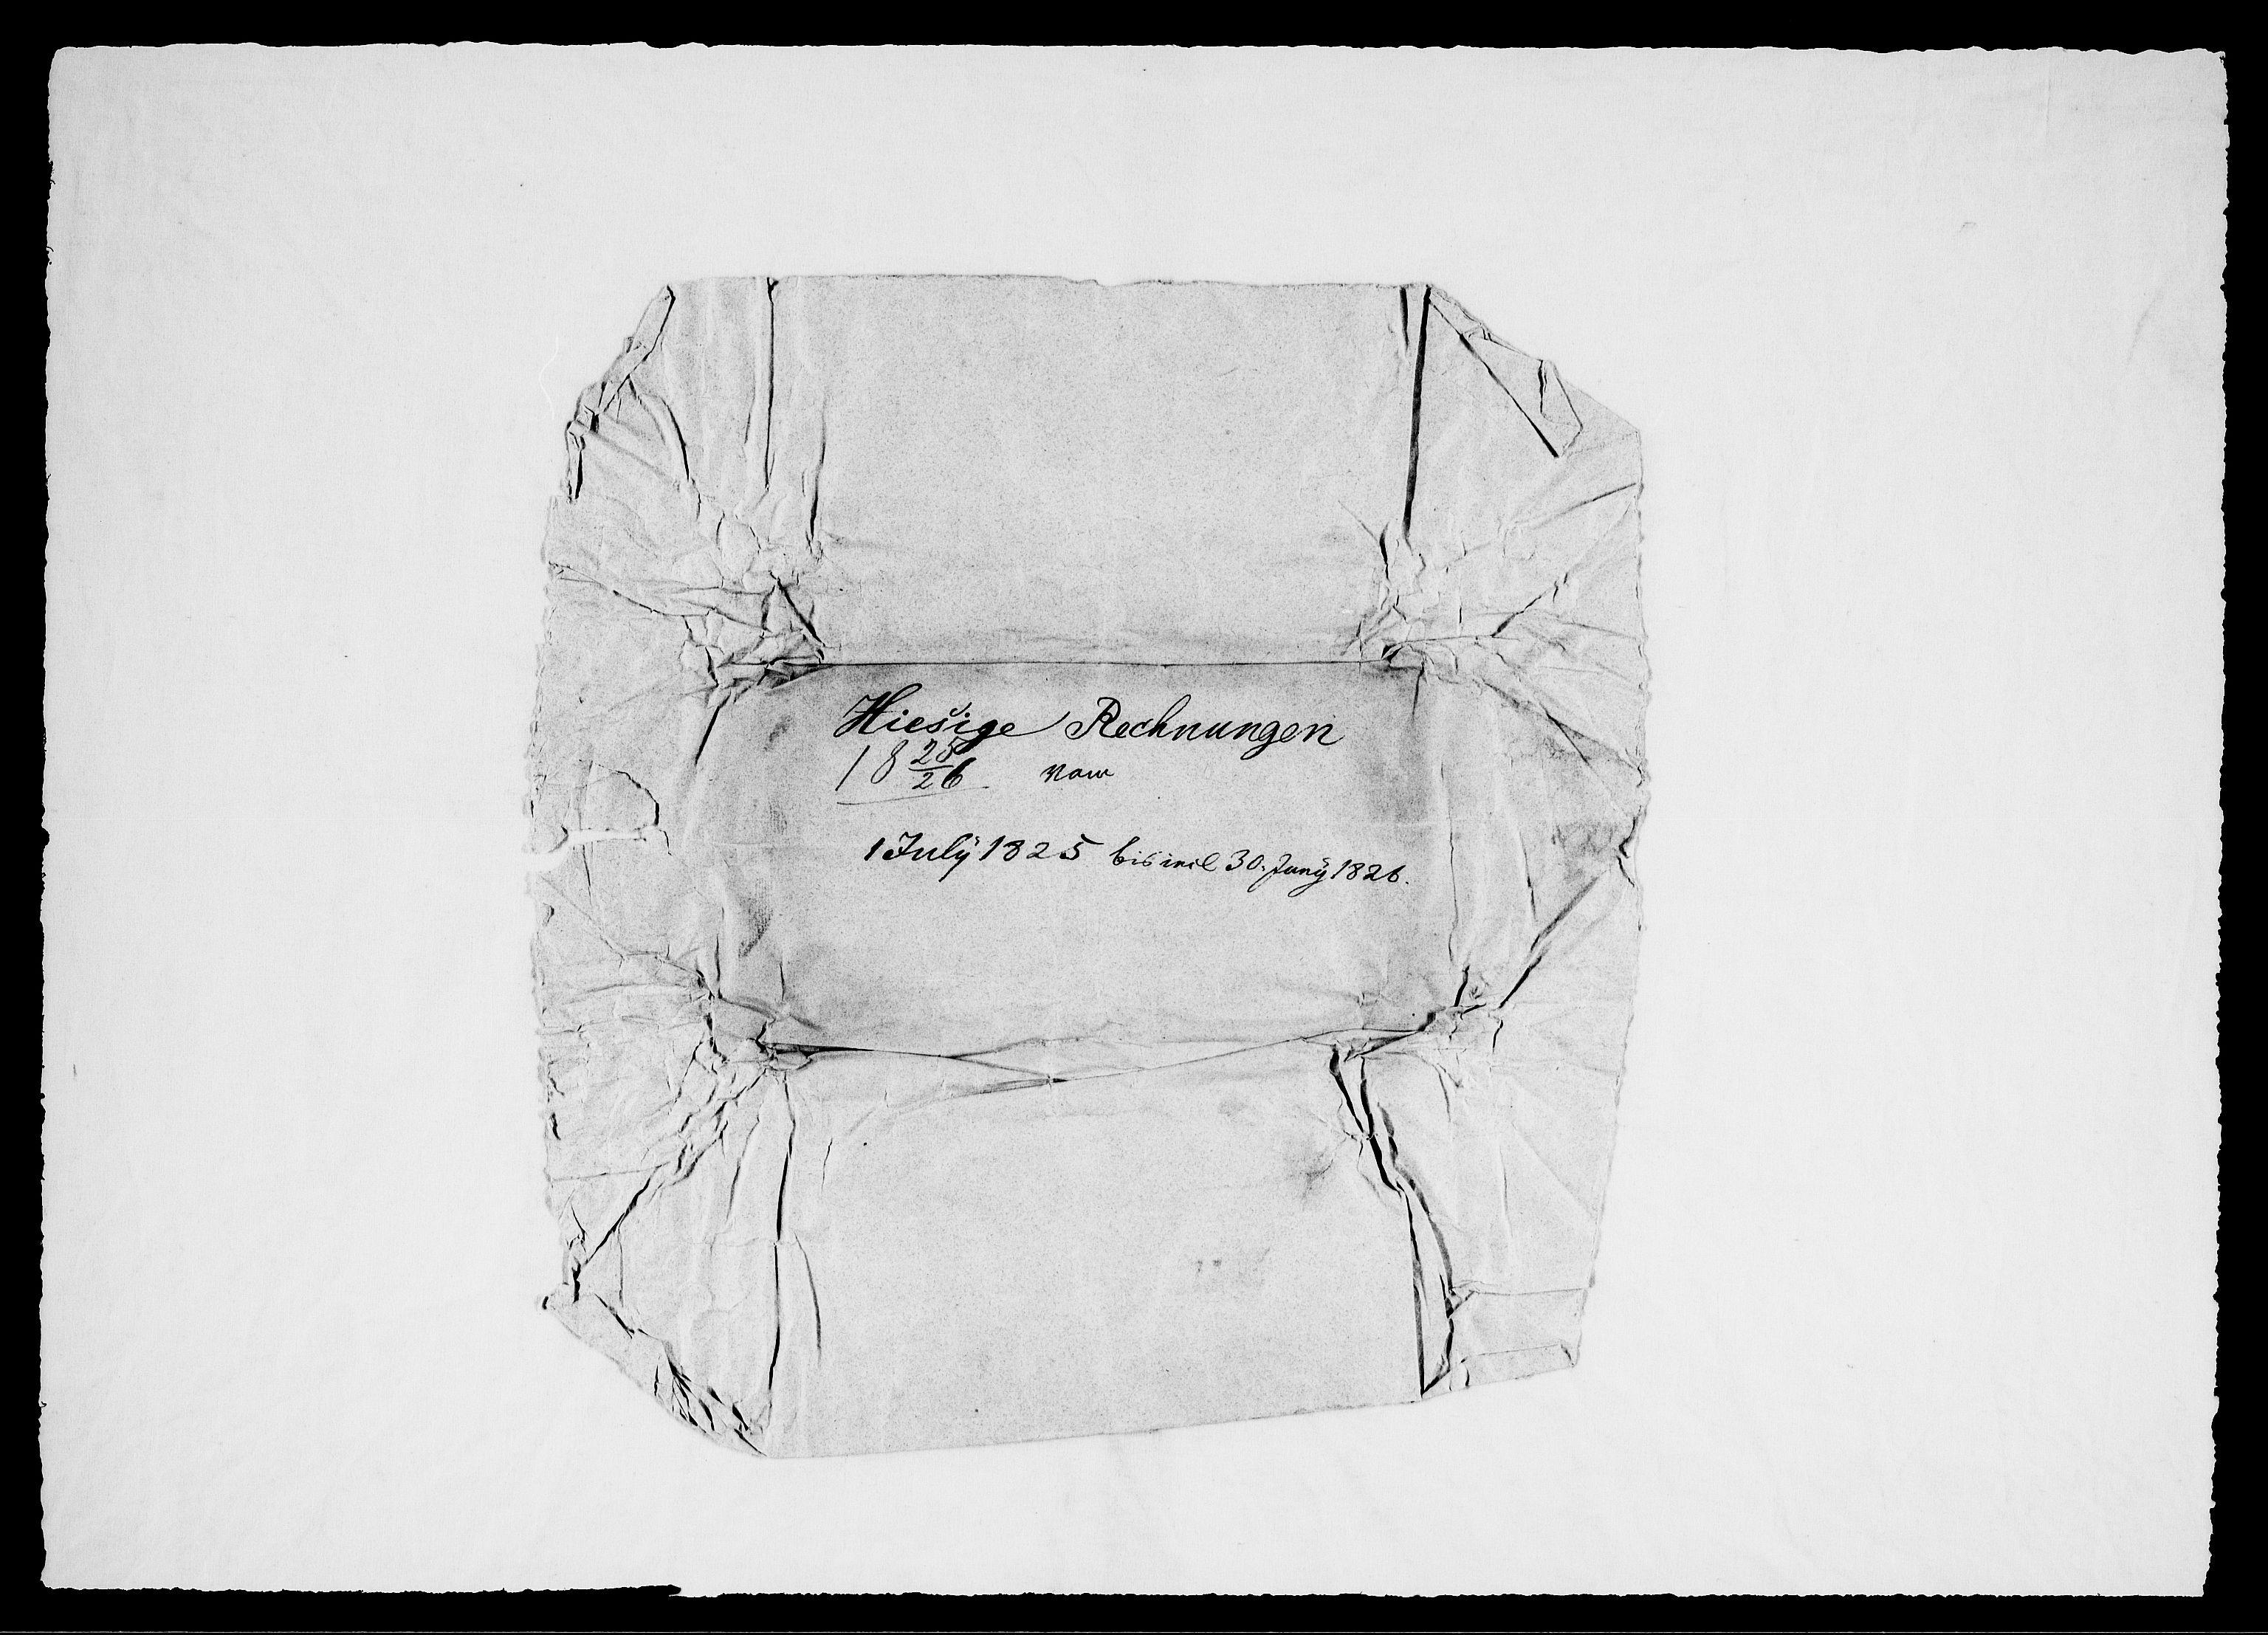 RA, Modums Blaafarveværk, G/Gd/Gdc/L0215, 1825-1828, s. 2